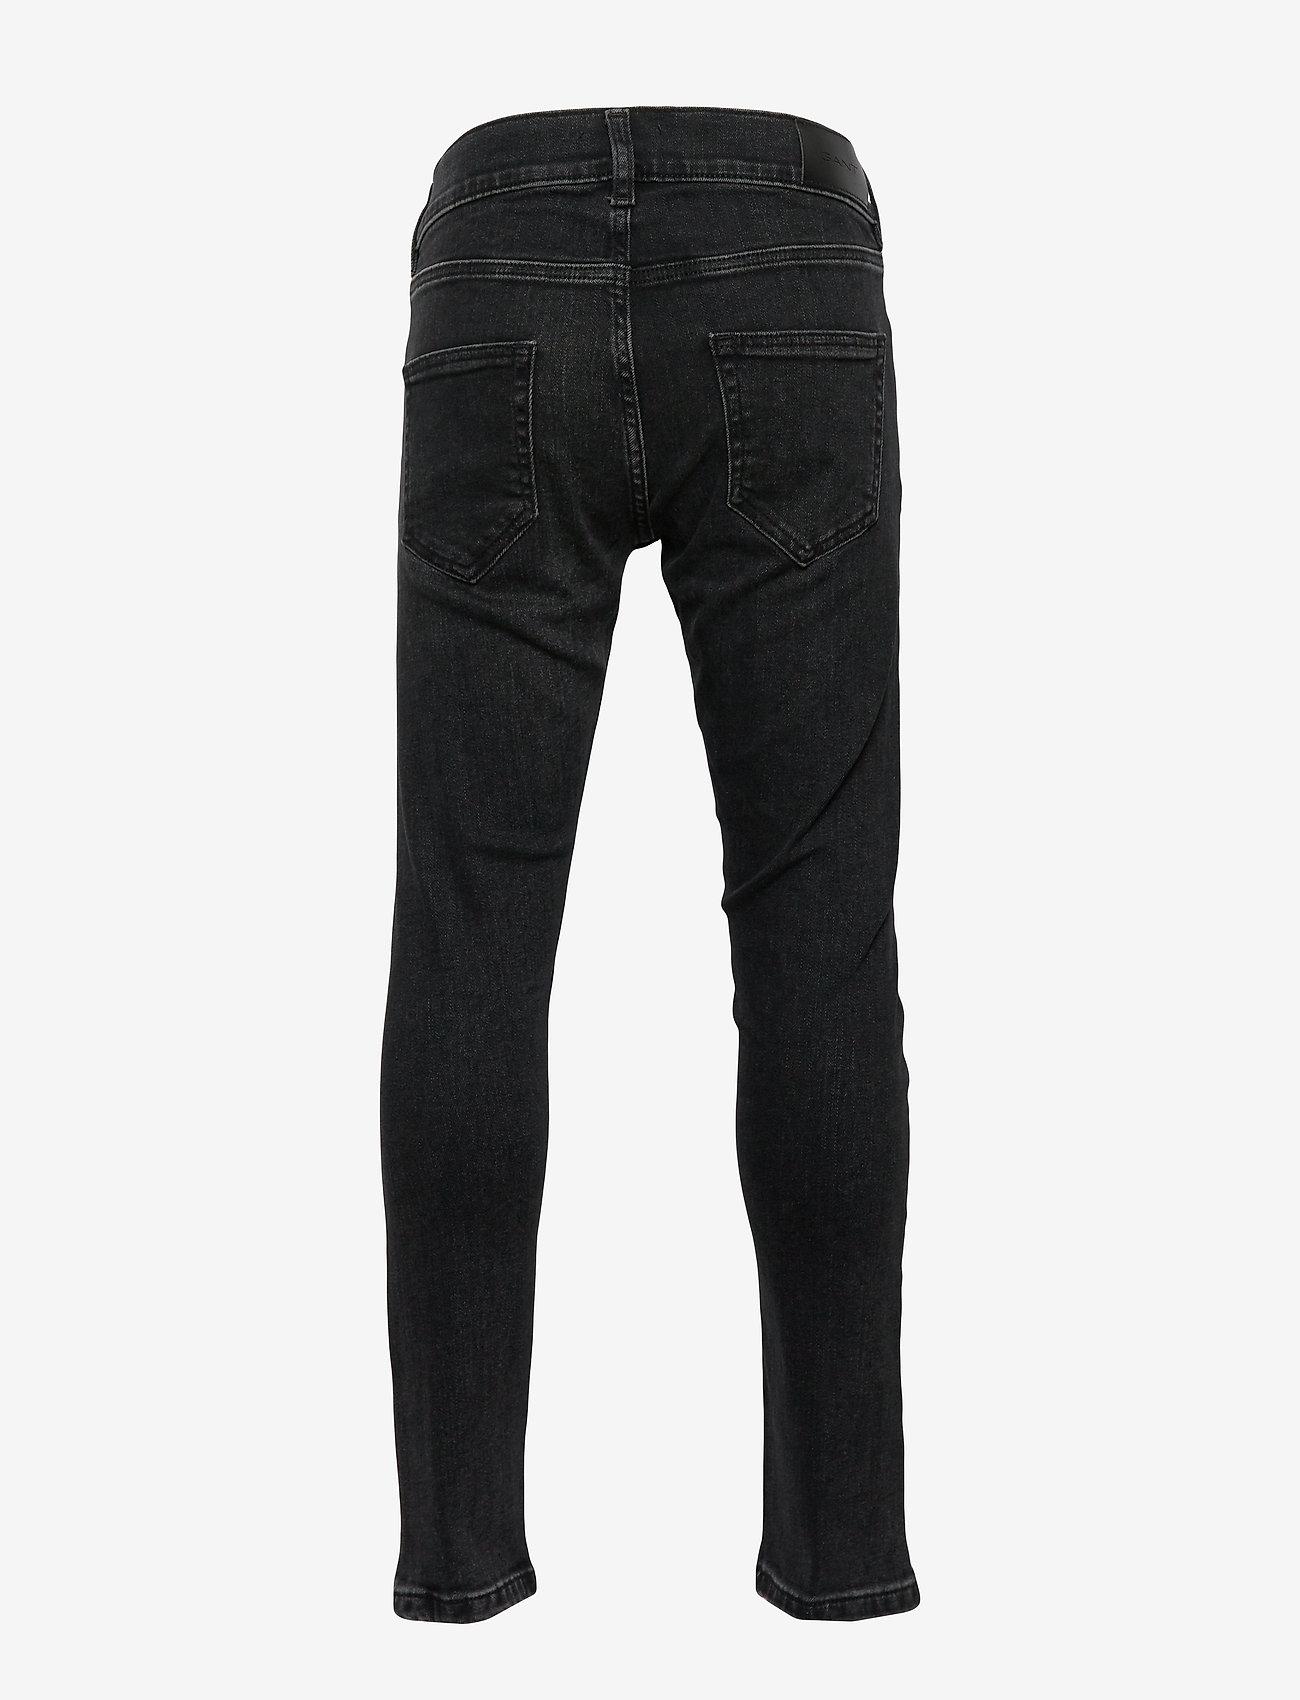 GANT - GANT SLIM JEANS - jeans - black raw - 1